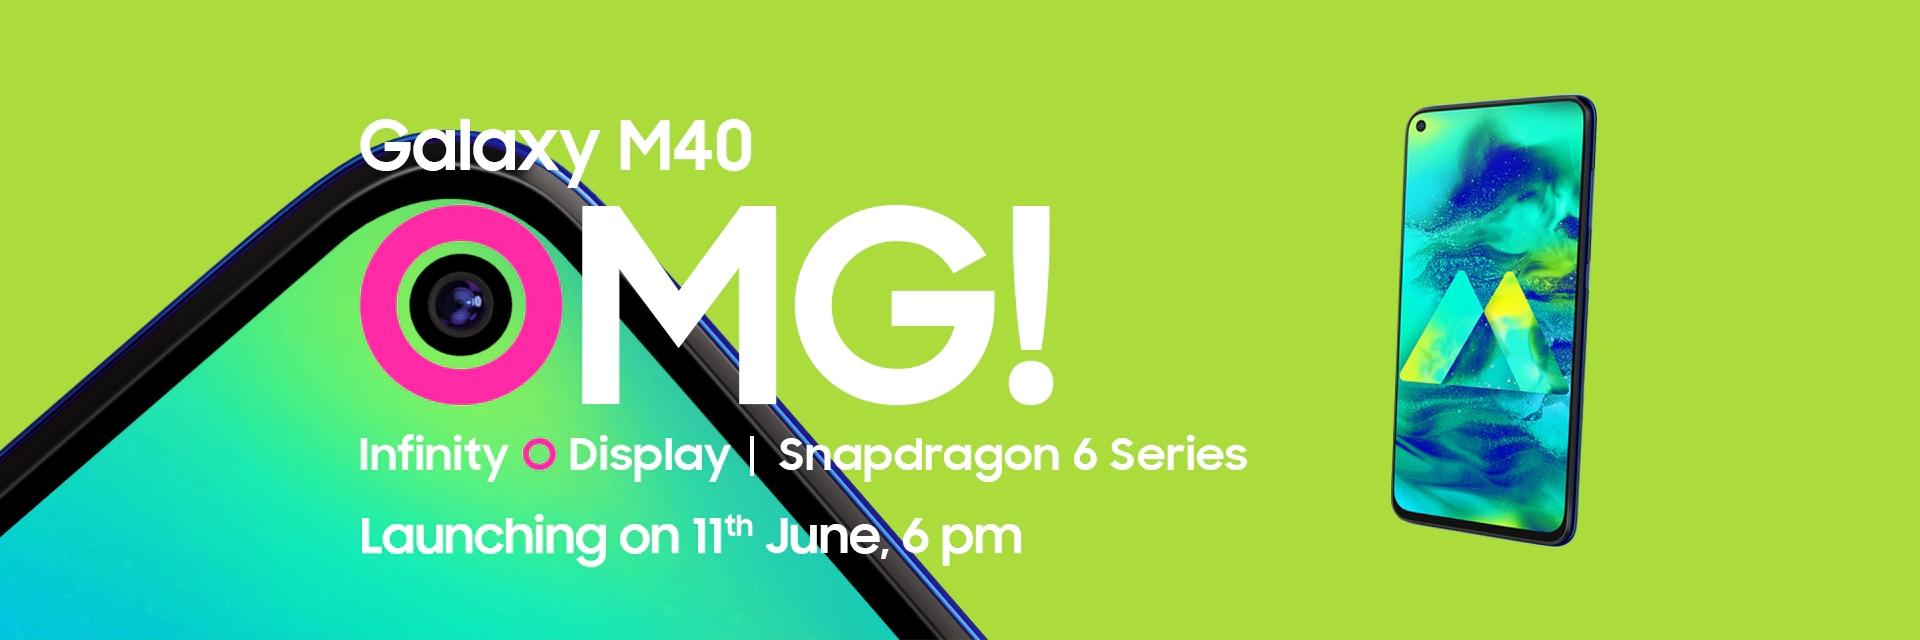 Samsung-Galaxy M40